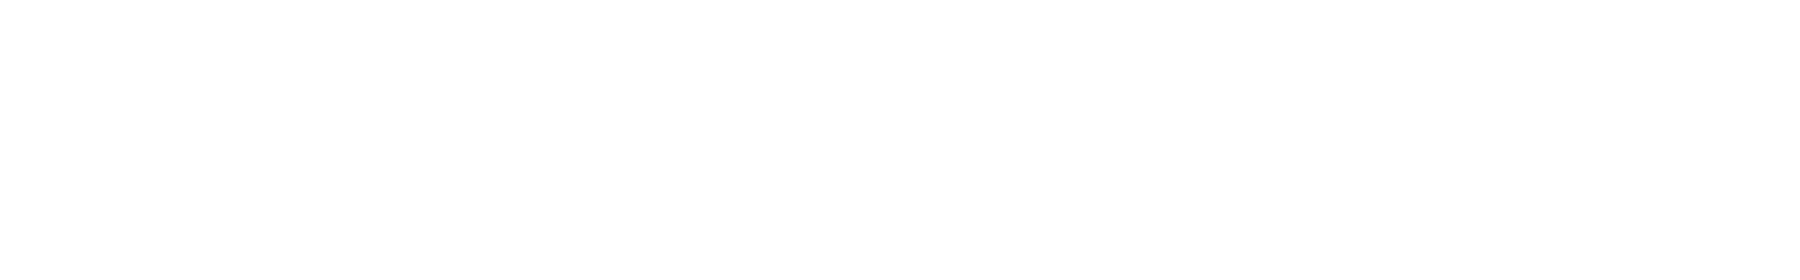 pth synth 06